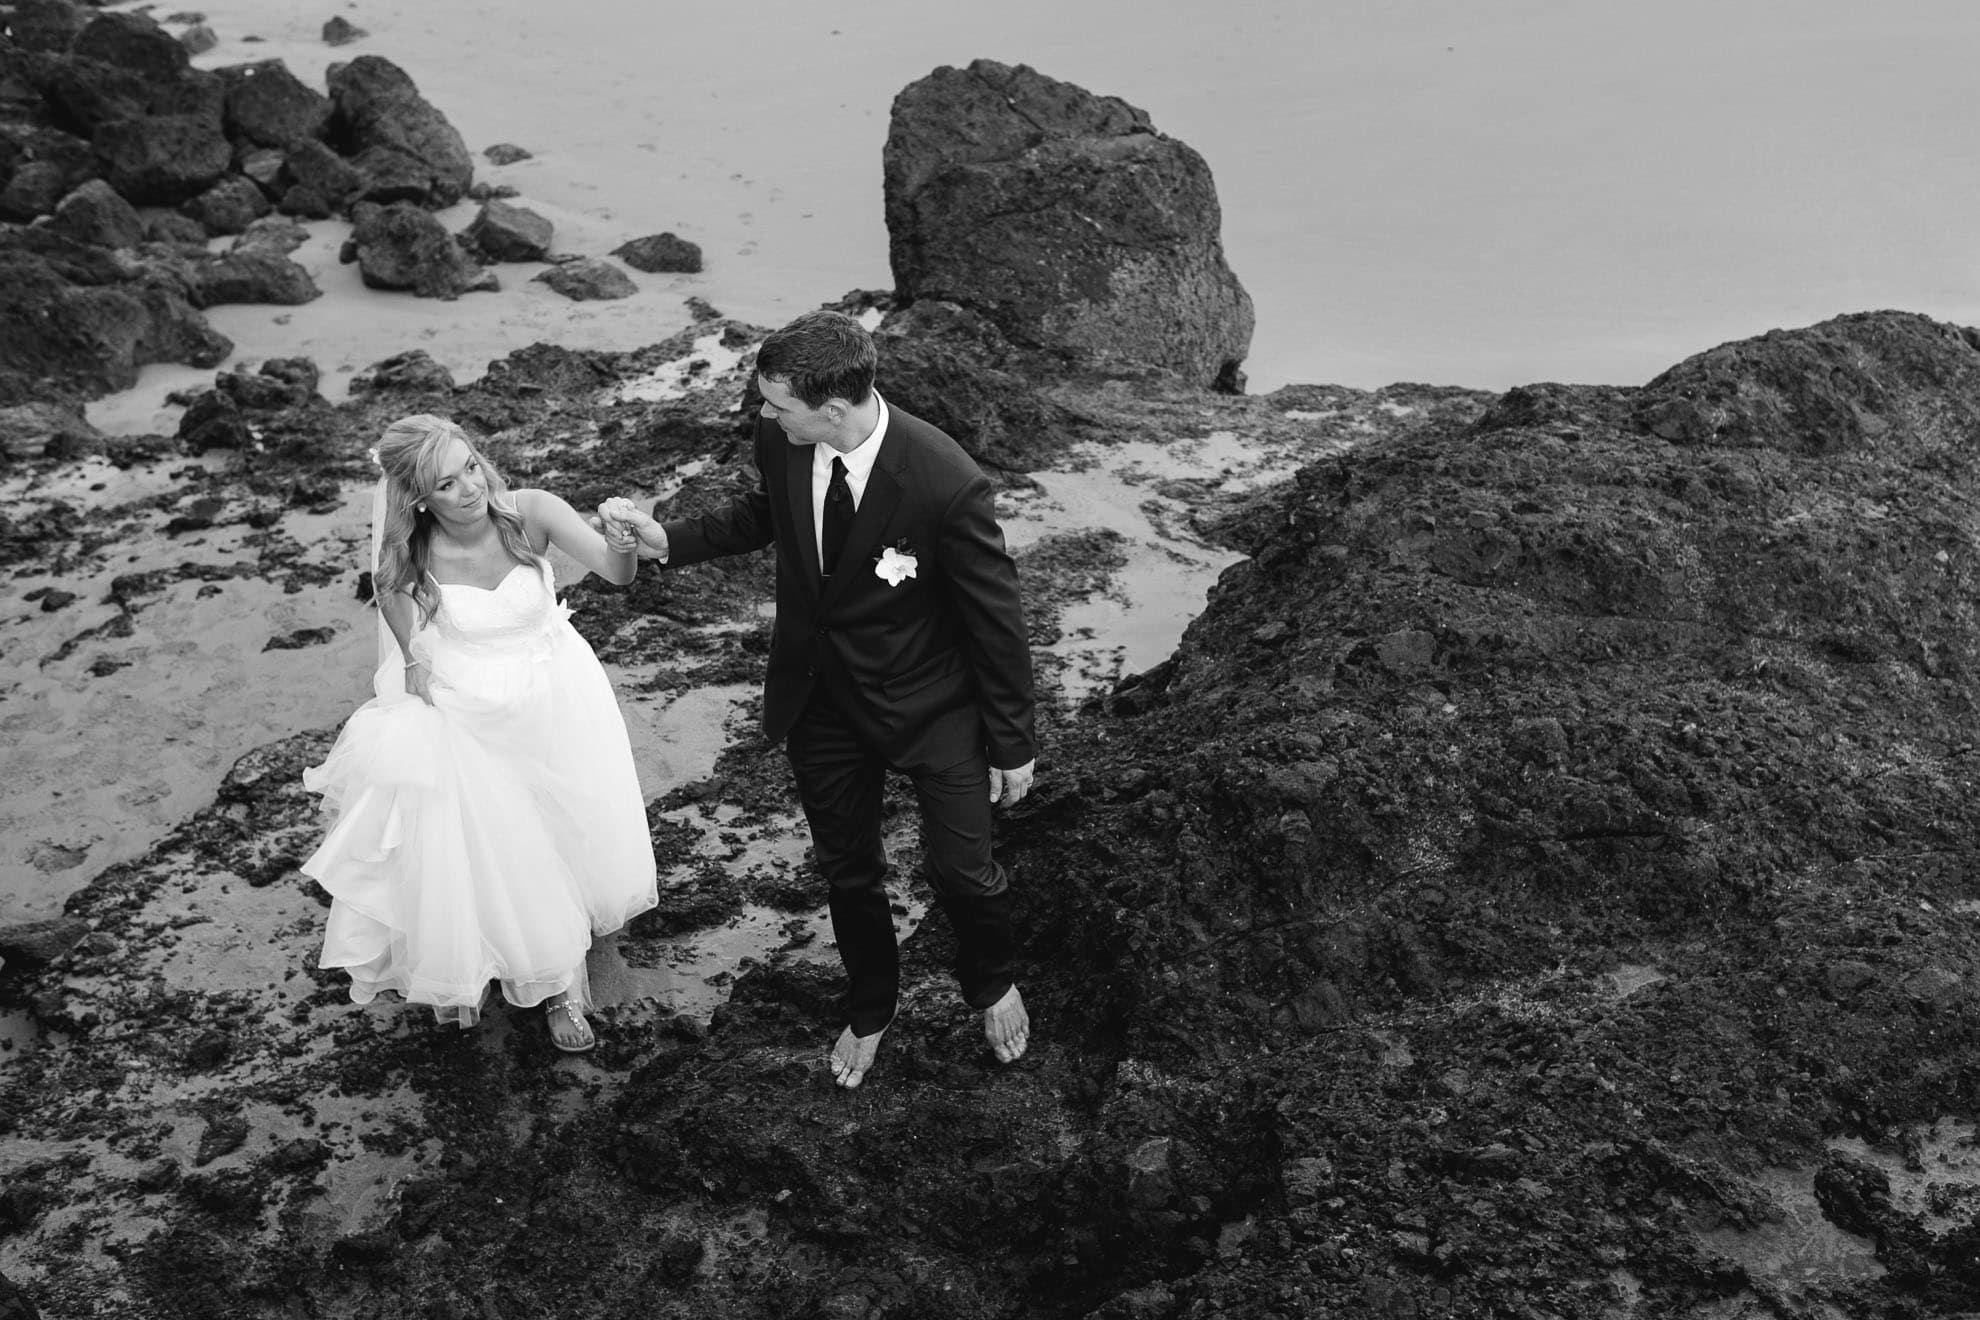 Bride and groom climbing rocks at wedding